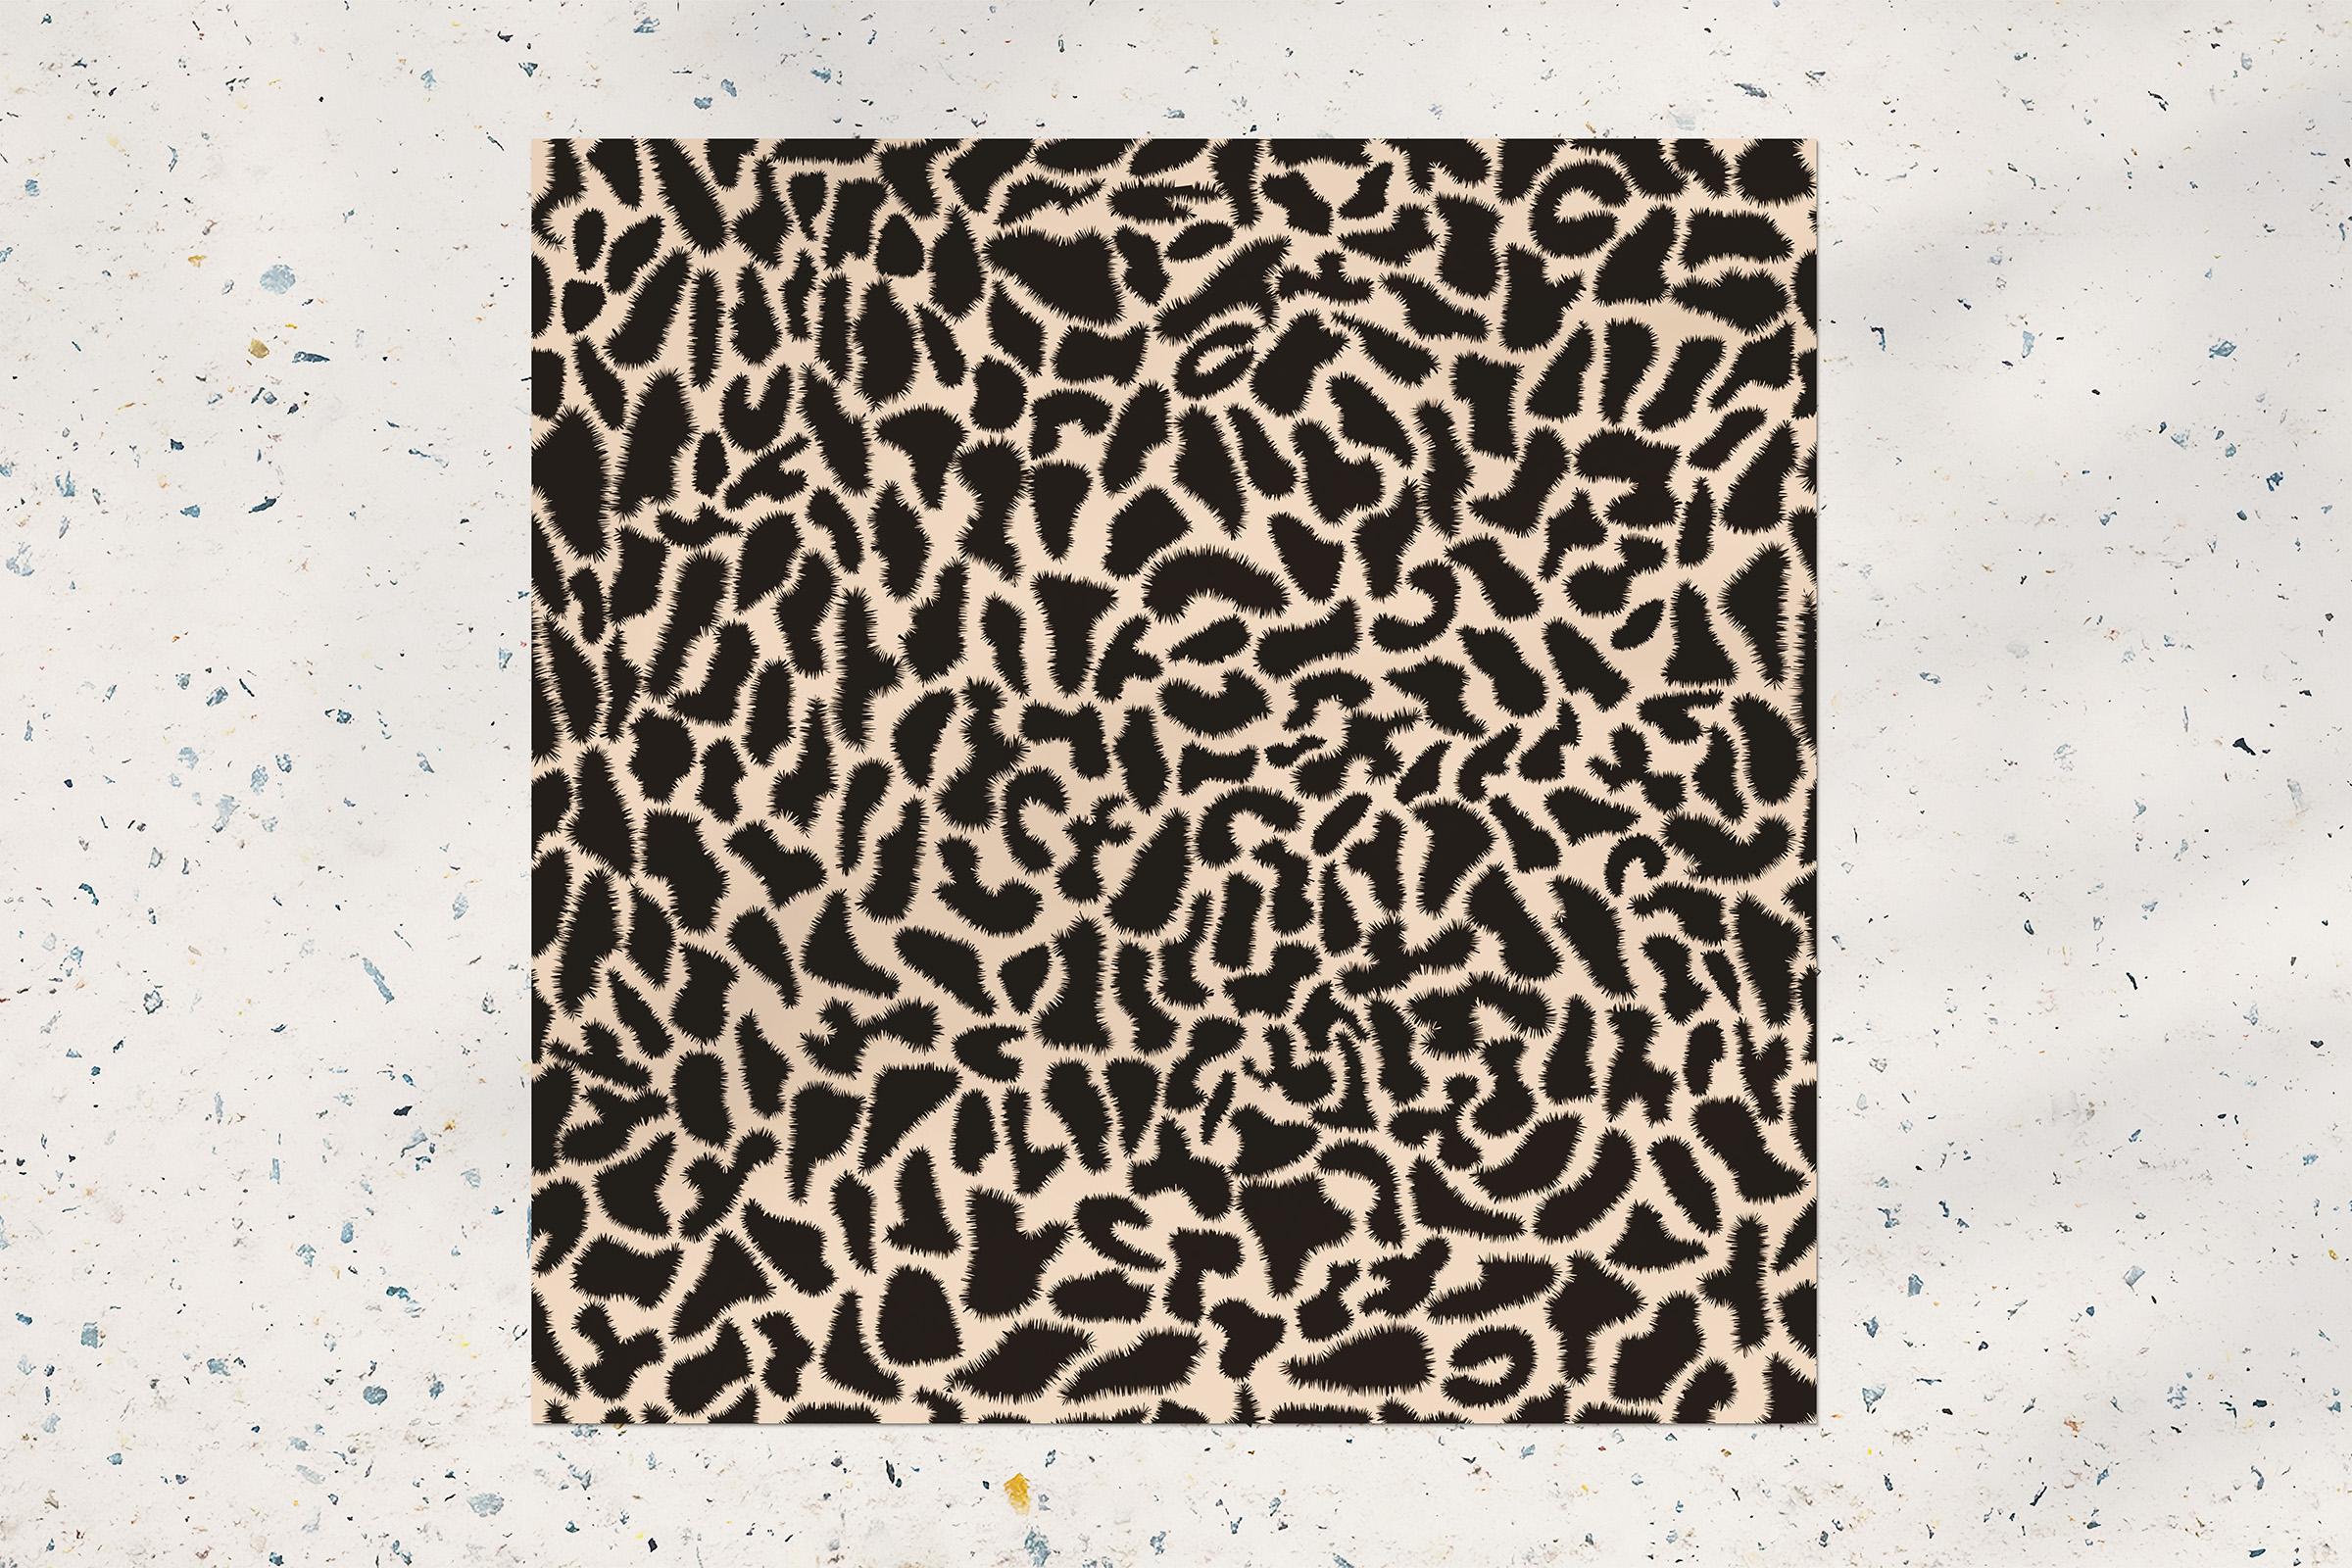 Animal print seamless pattern example image 2